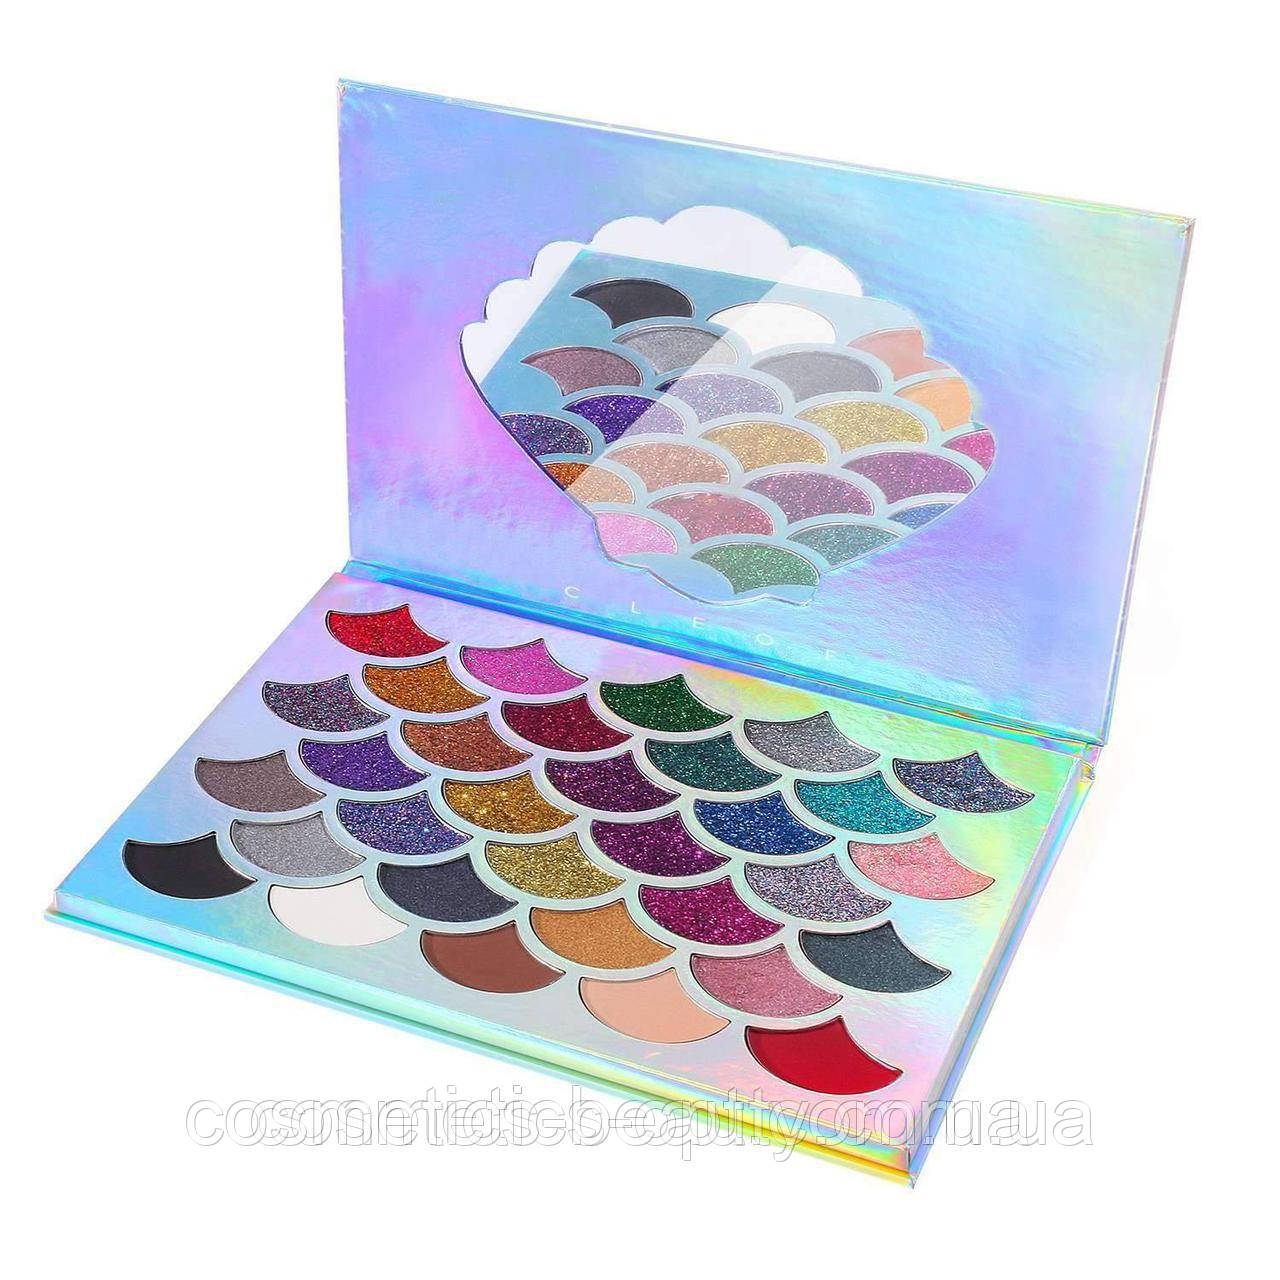 Тени-глиттеры для век Cleof Mermaid Glitter Palette eyeshadow-32 colors (реплика).